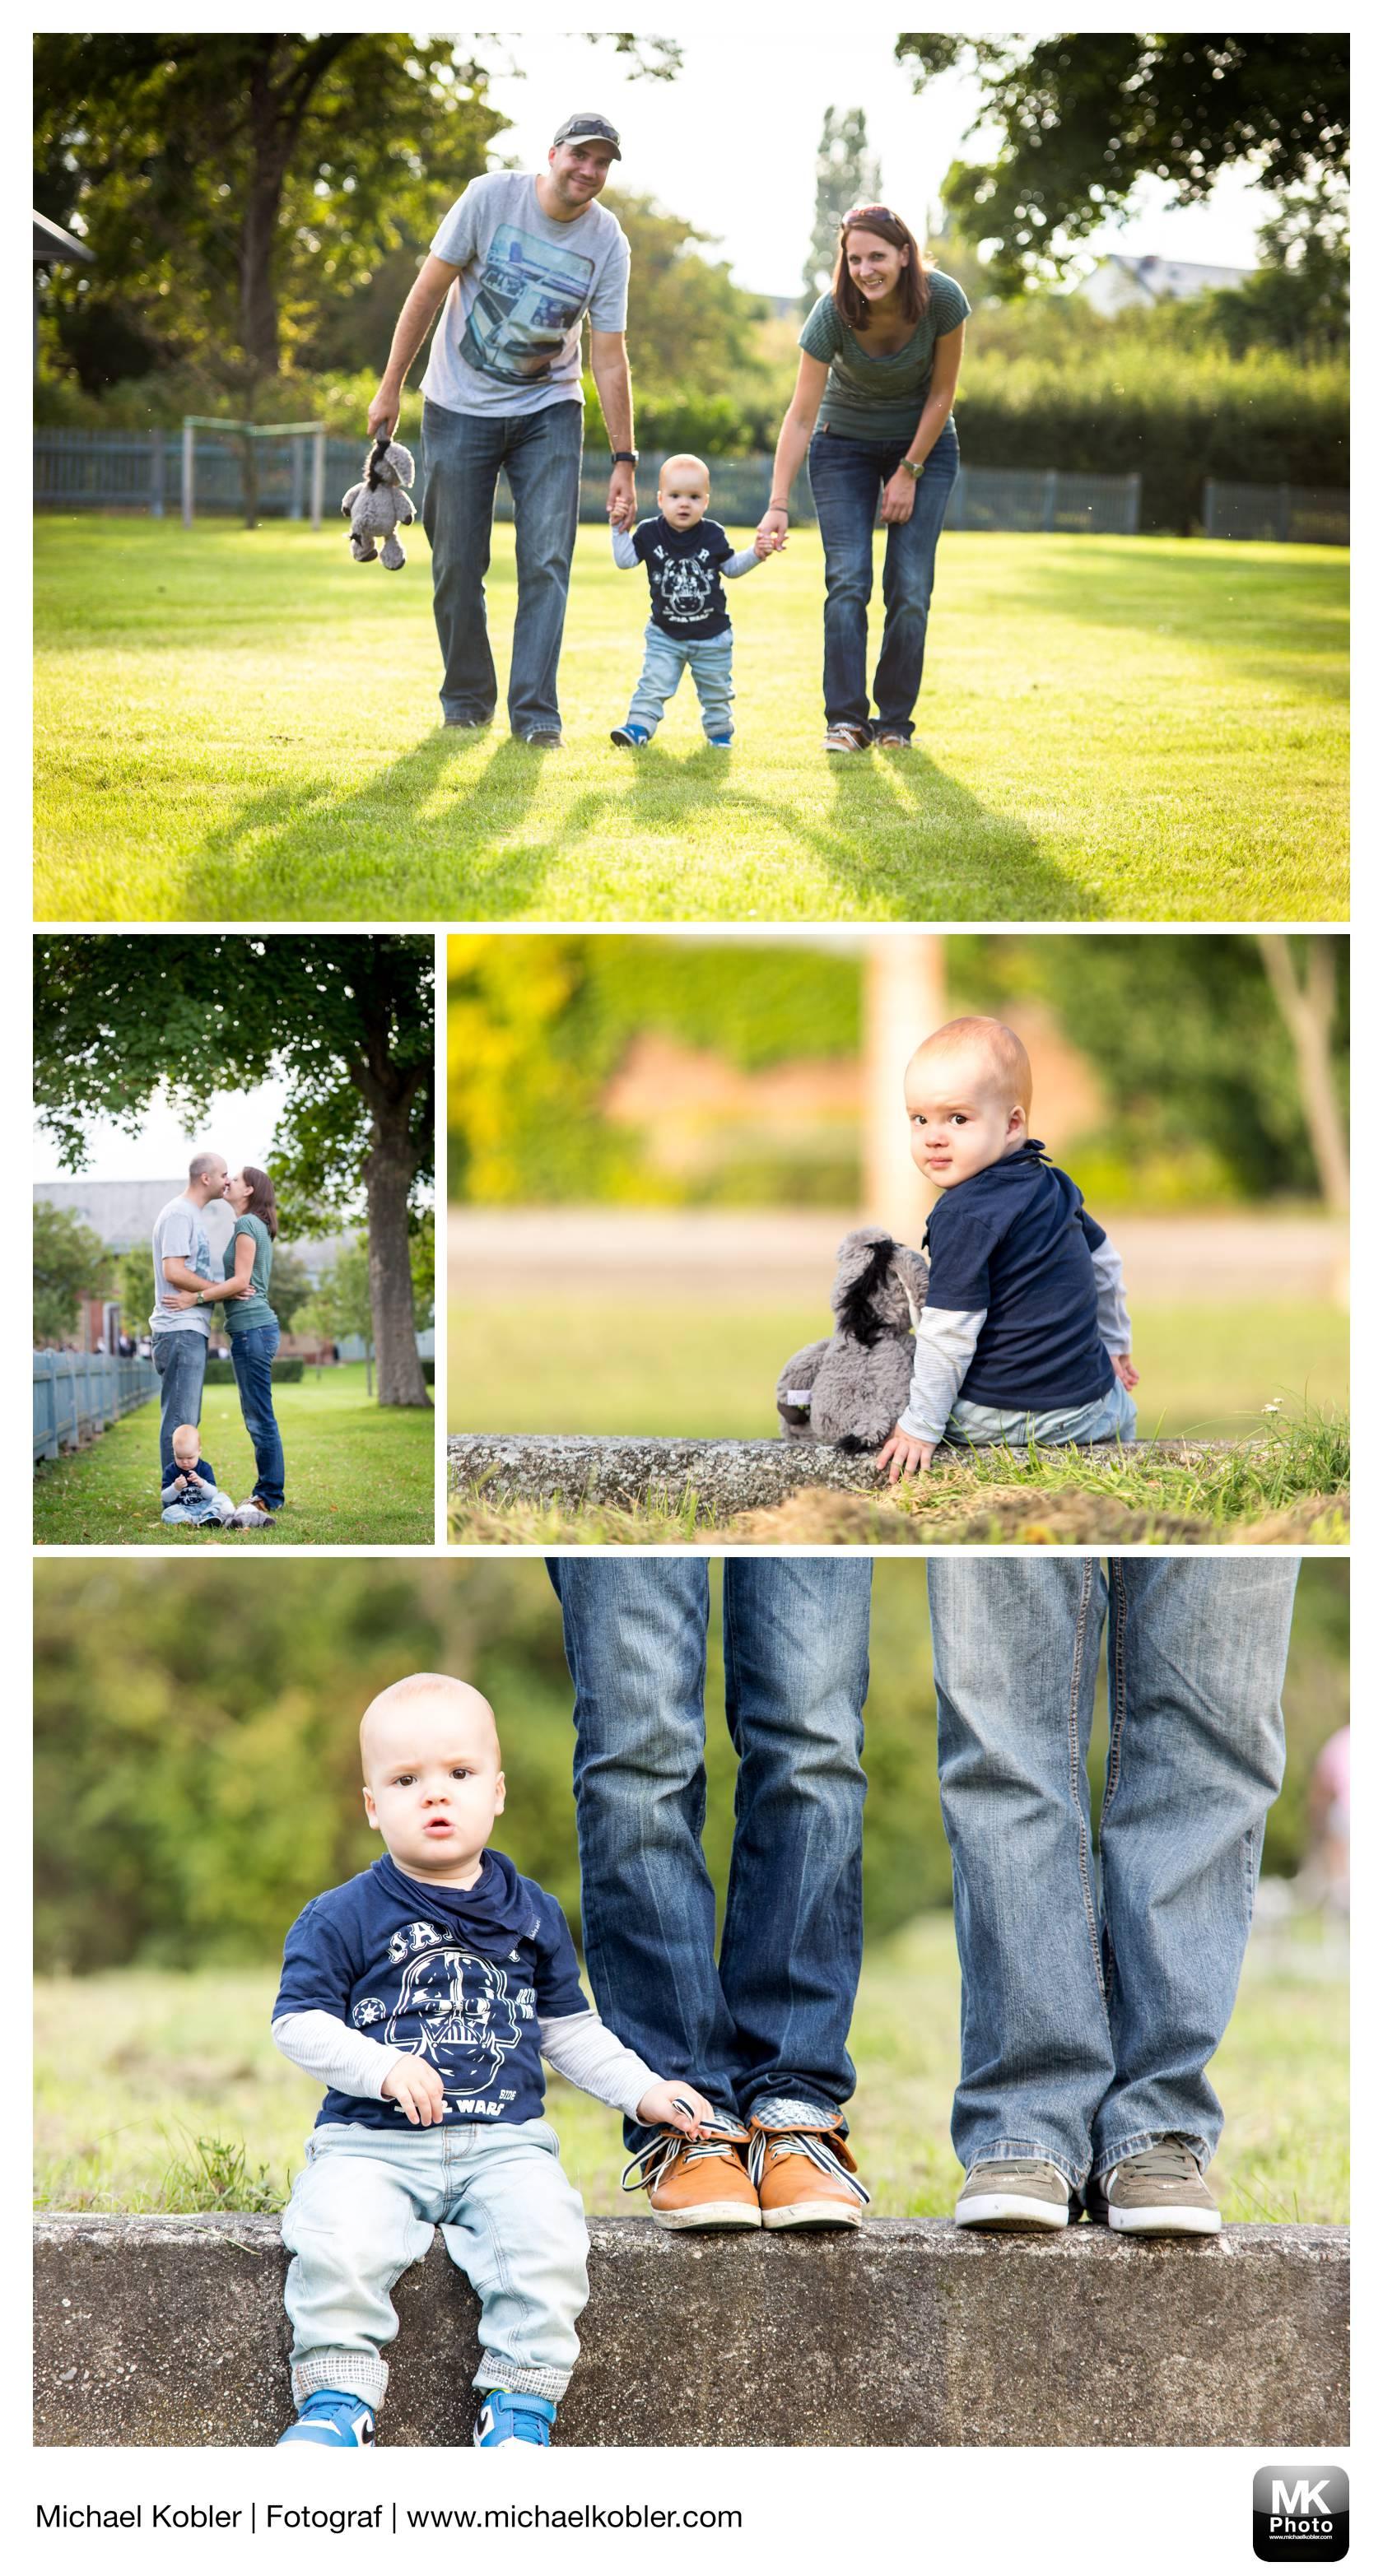 familyportrait_michael_kobler_fotograf.jpg